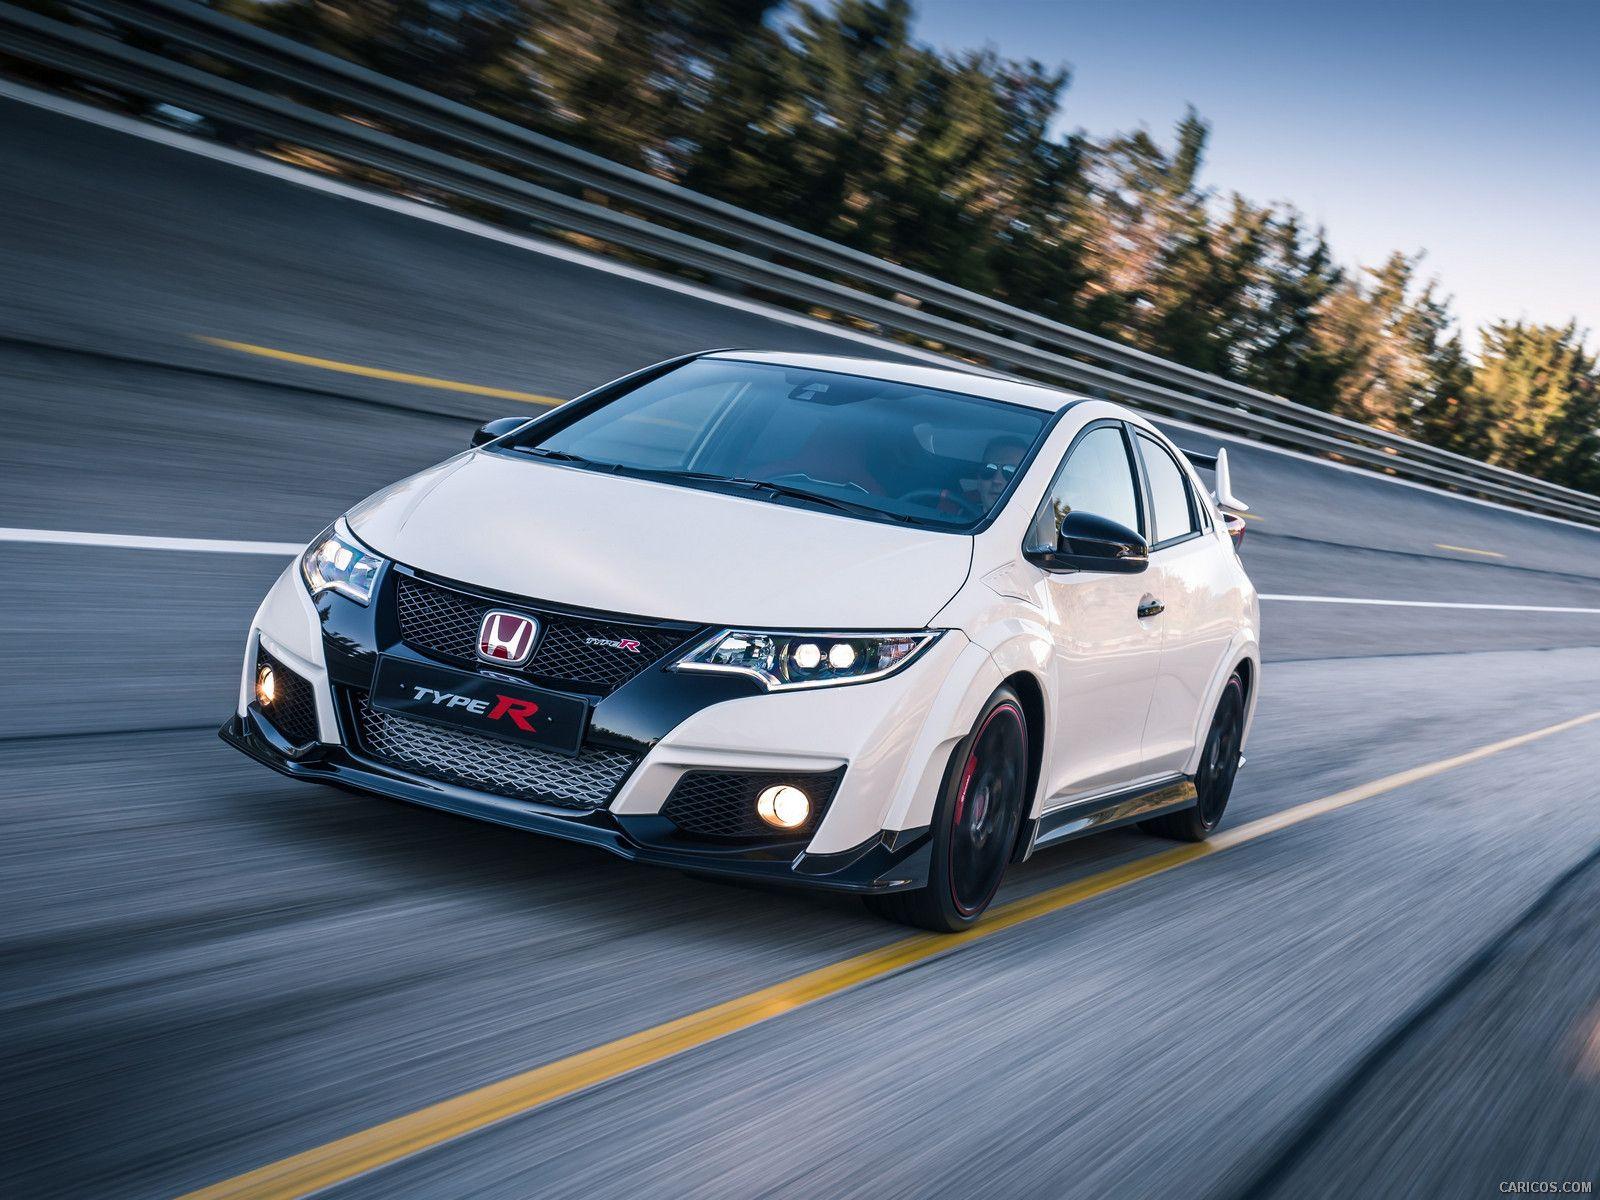 2015 Honda Civic Type R Wallpaper Honda civic type r